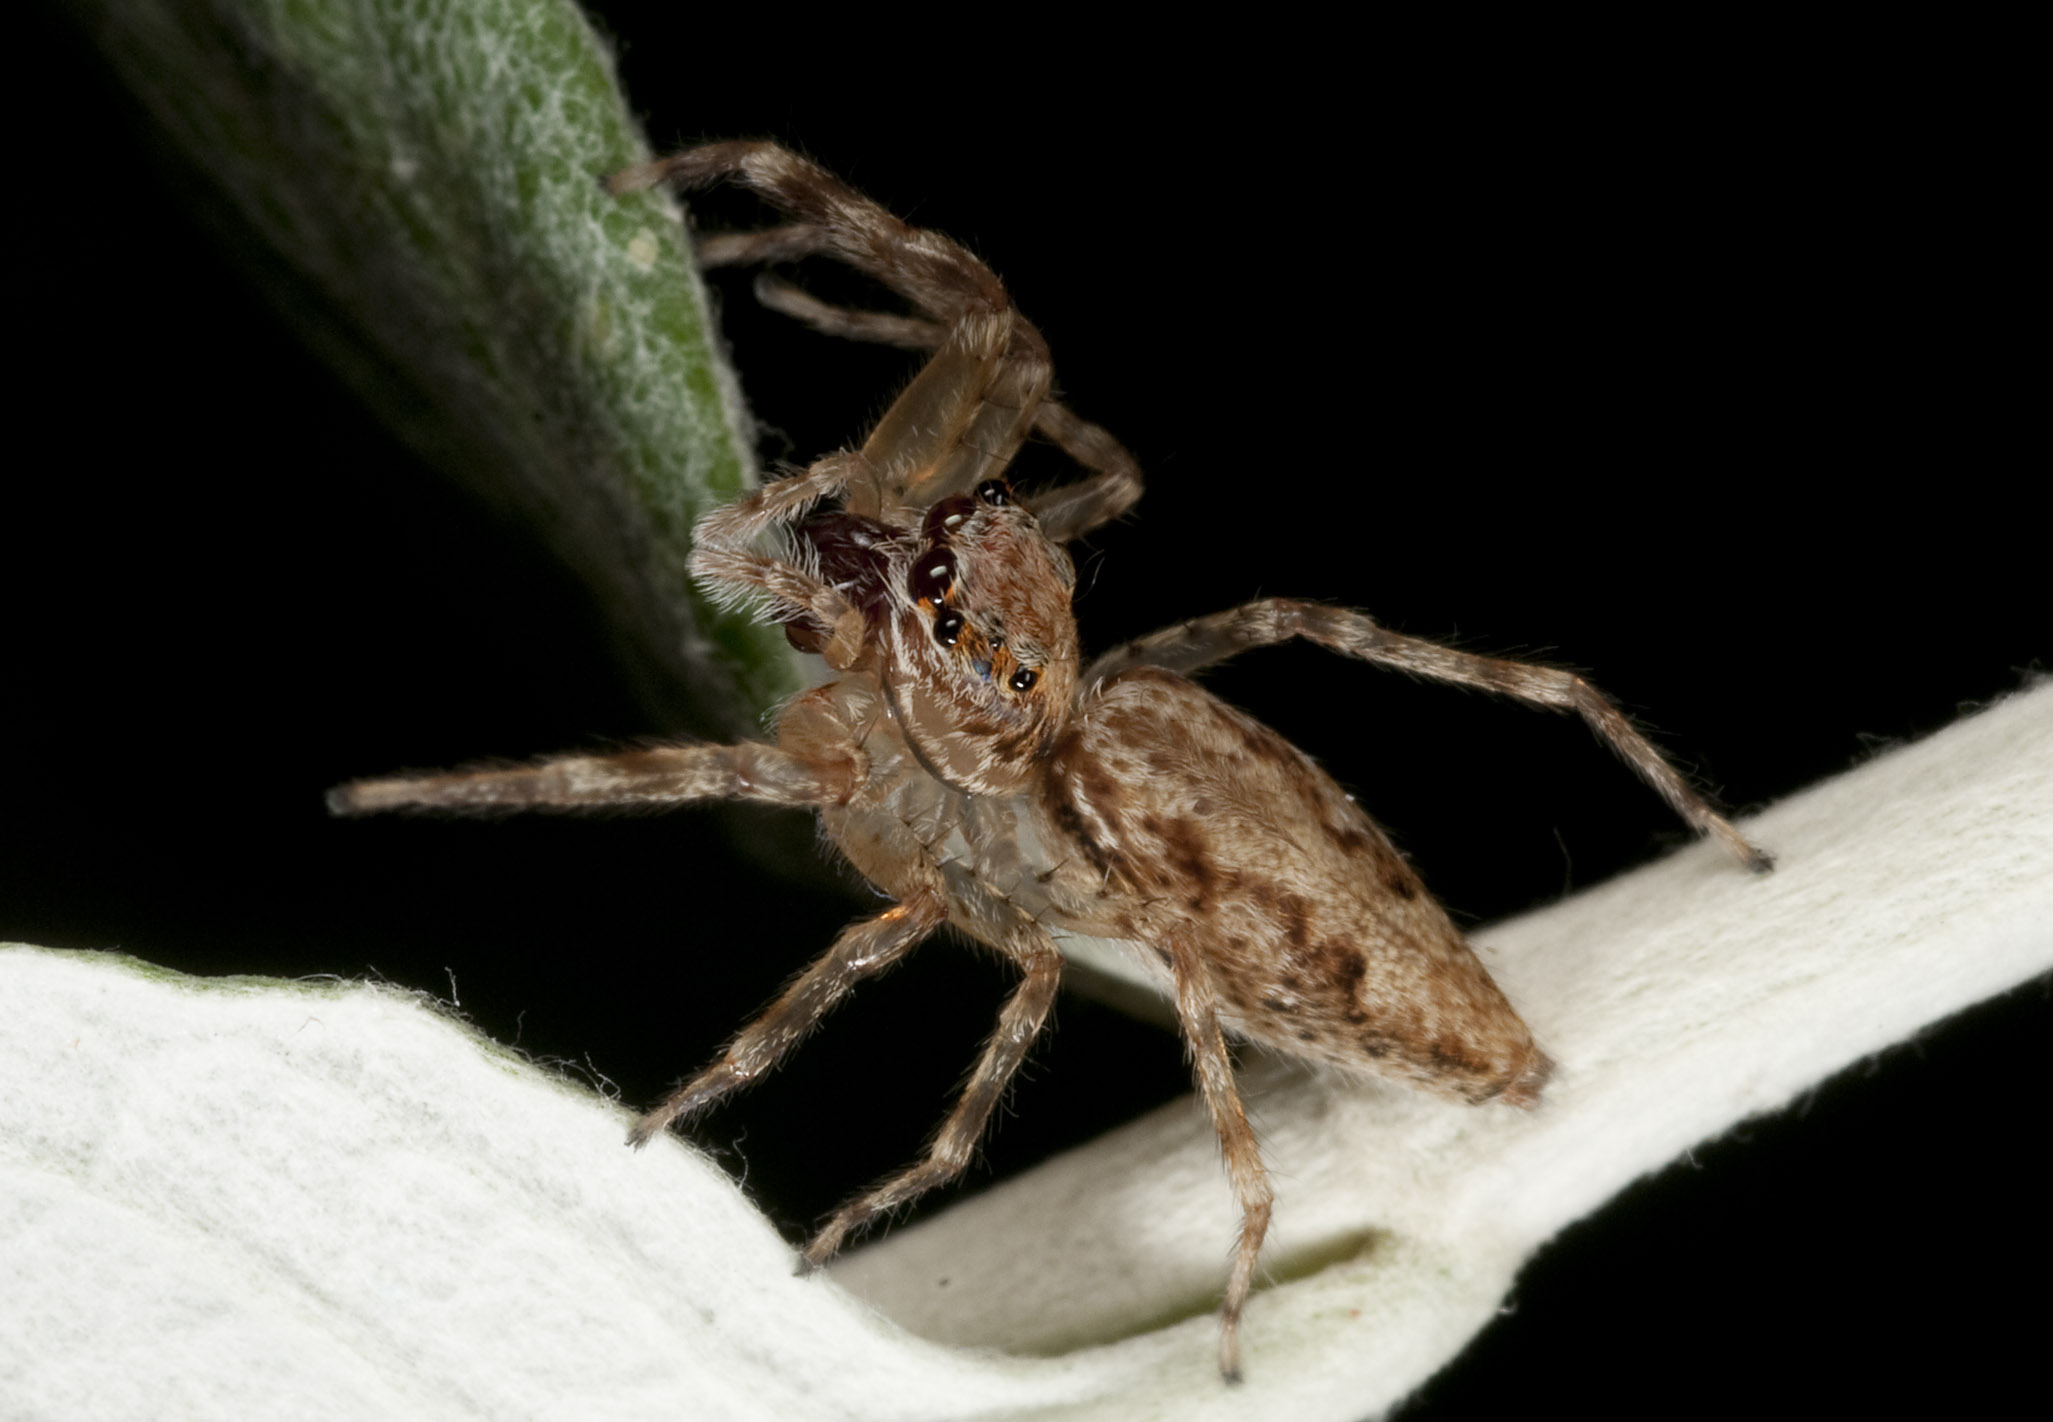 Jumping_Spider_201102116_Herne_Bay_Auckland_NZ_1.jpg